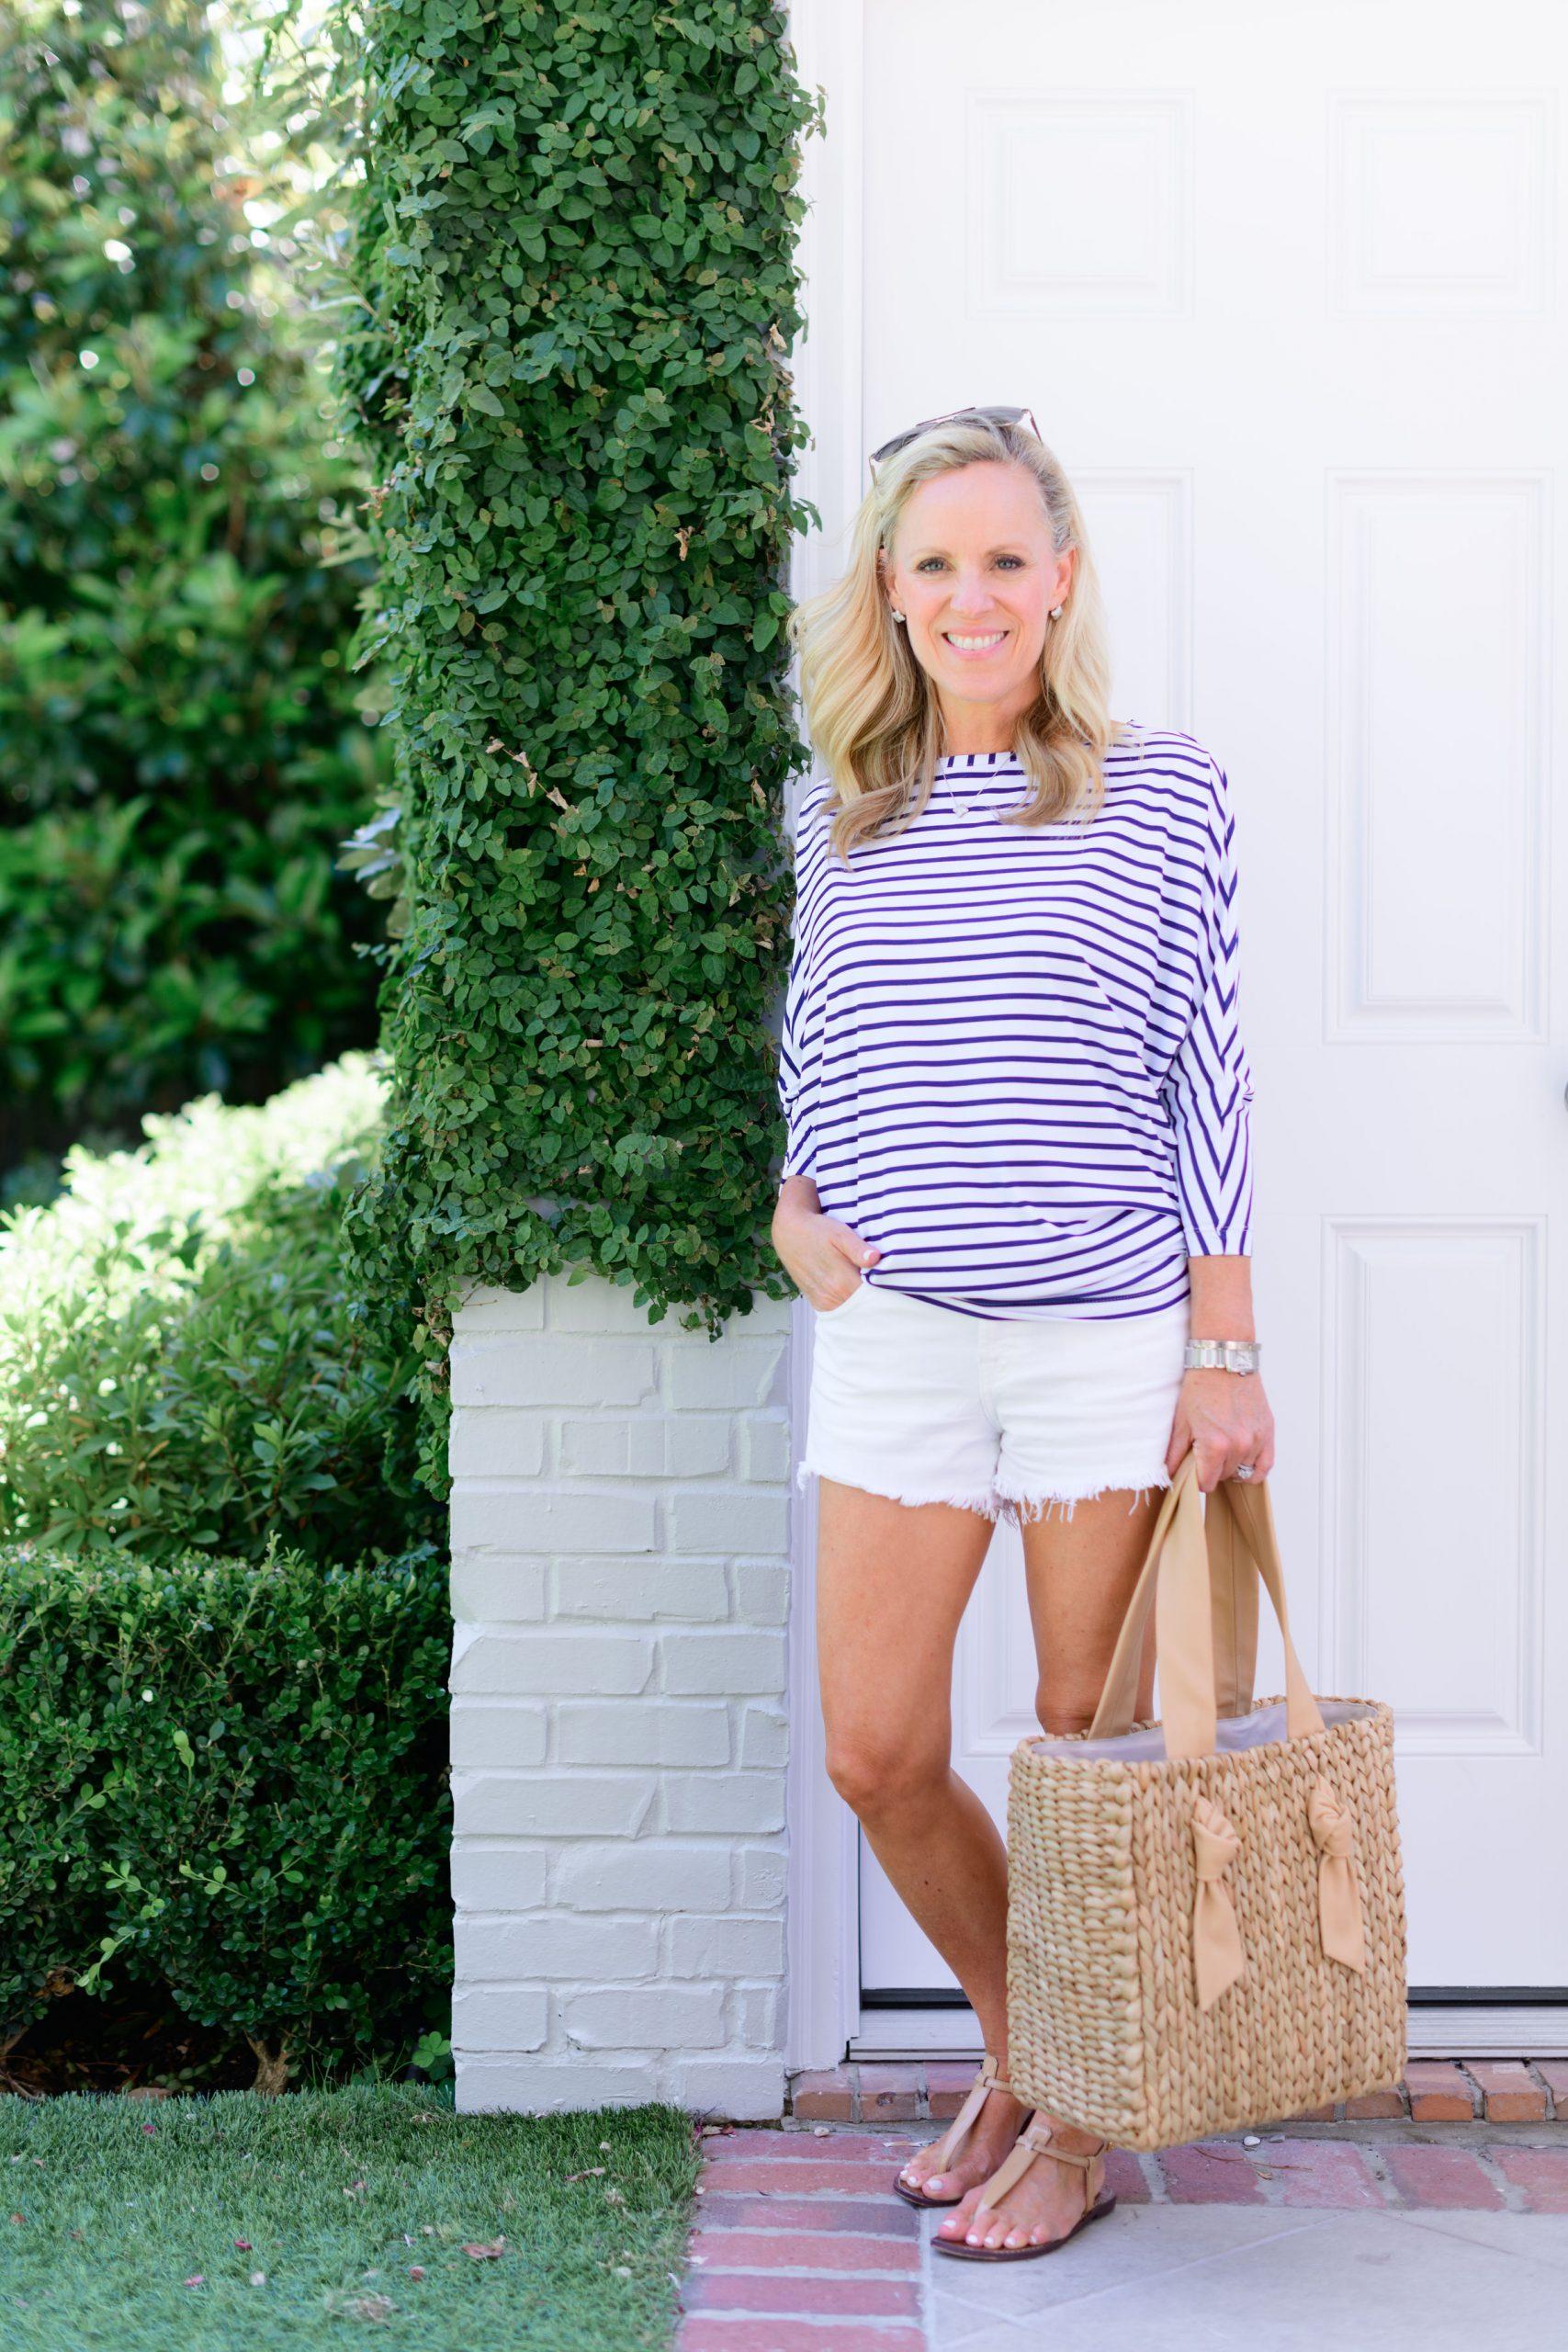 Alicia Wood Lifestyle-Color Crush: Blue & White Stripes